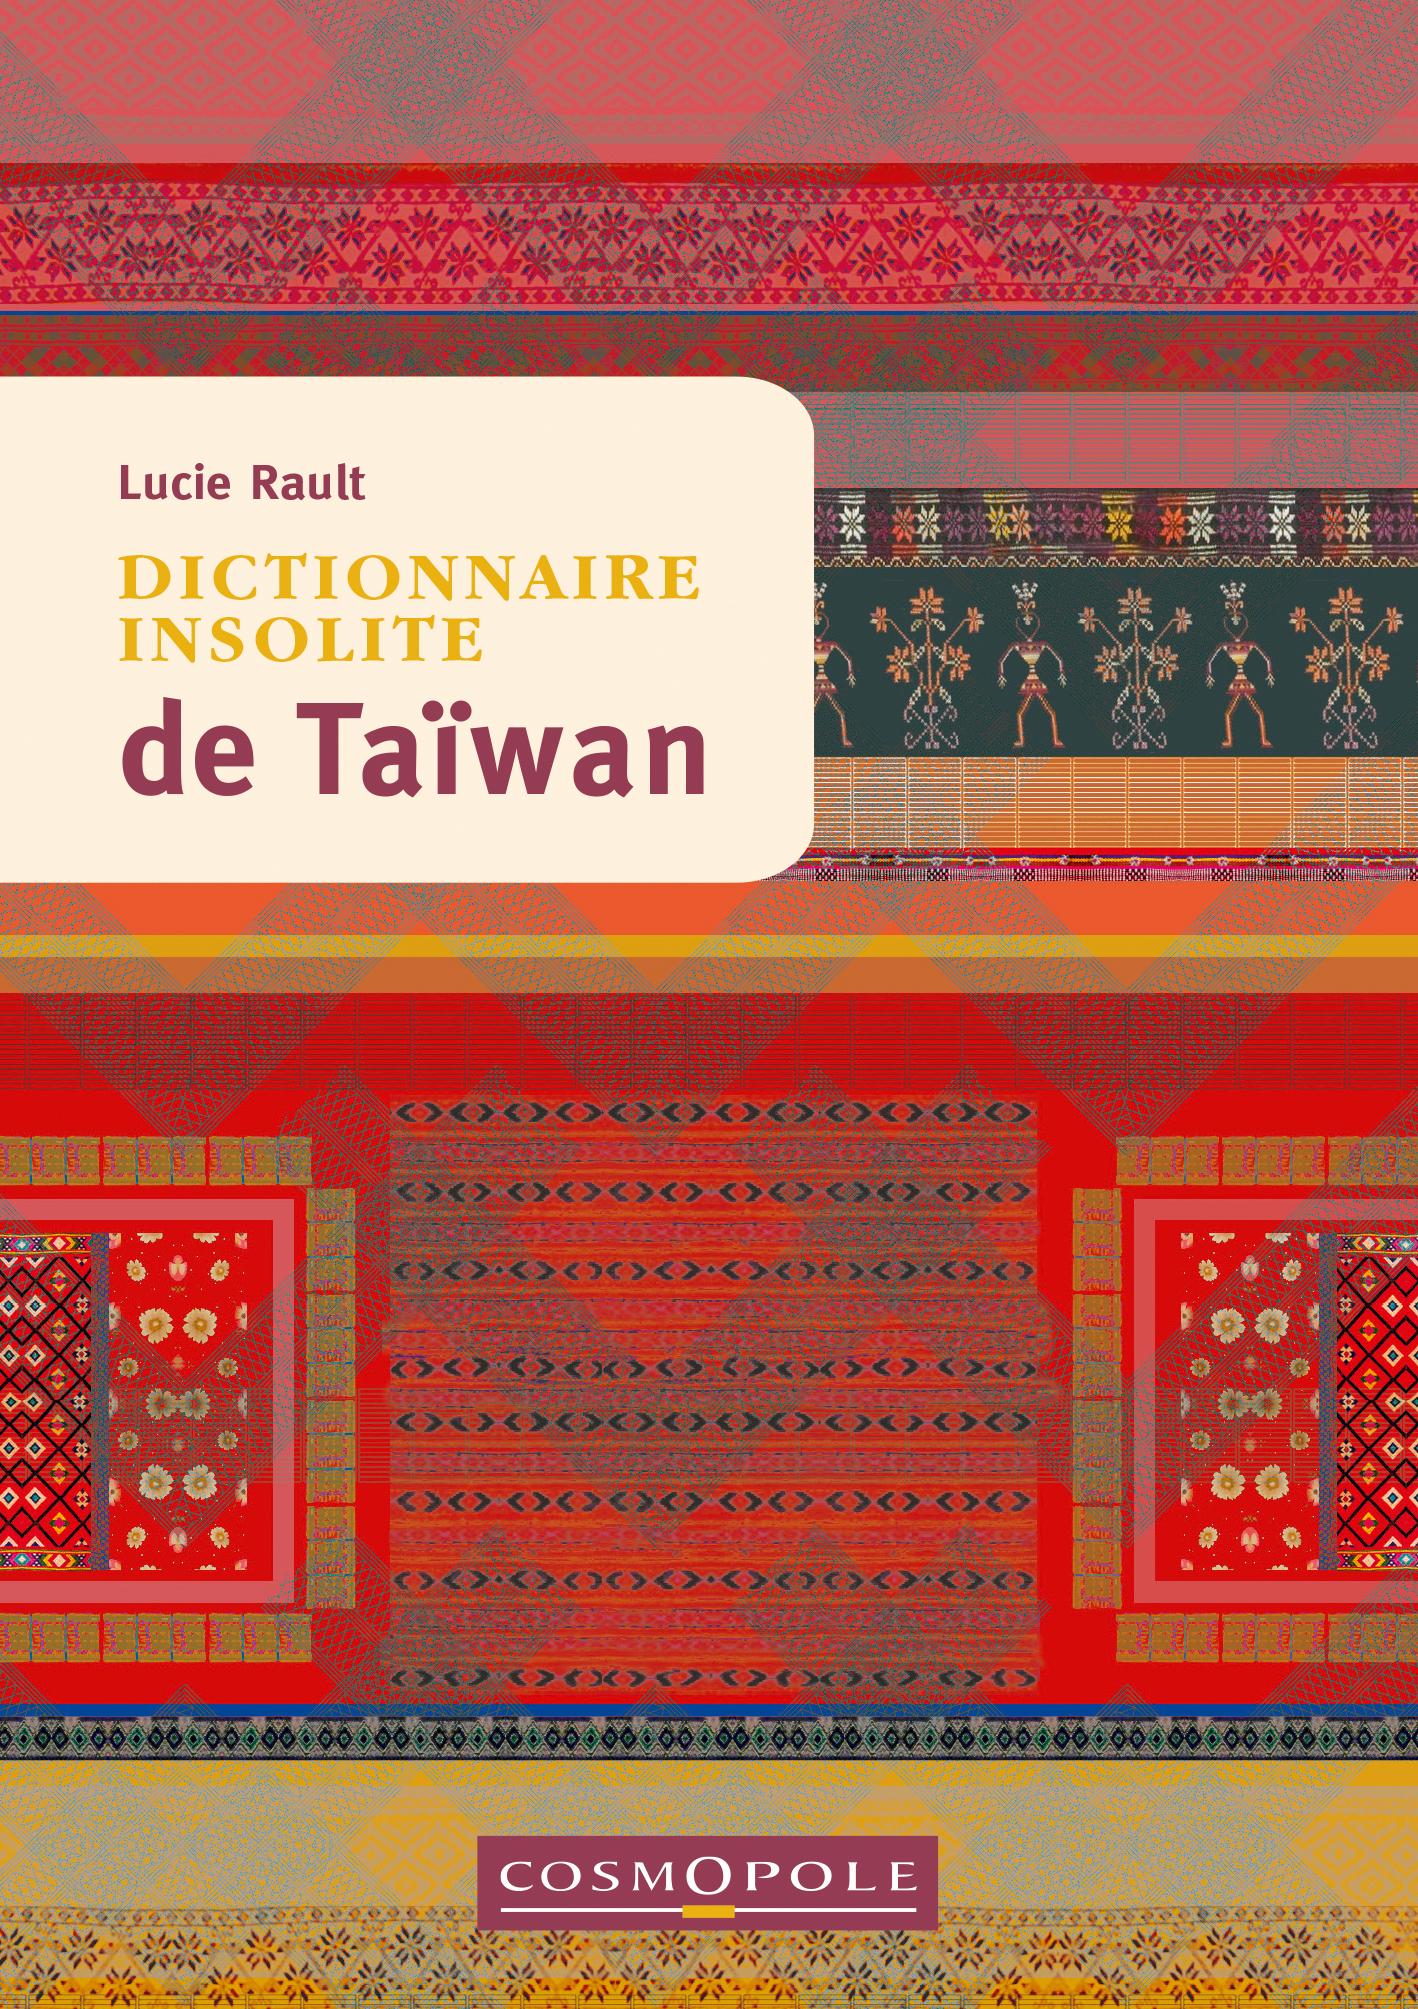 COUV TAIWAN PRINT.indd